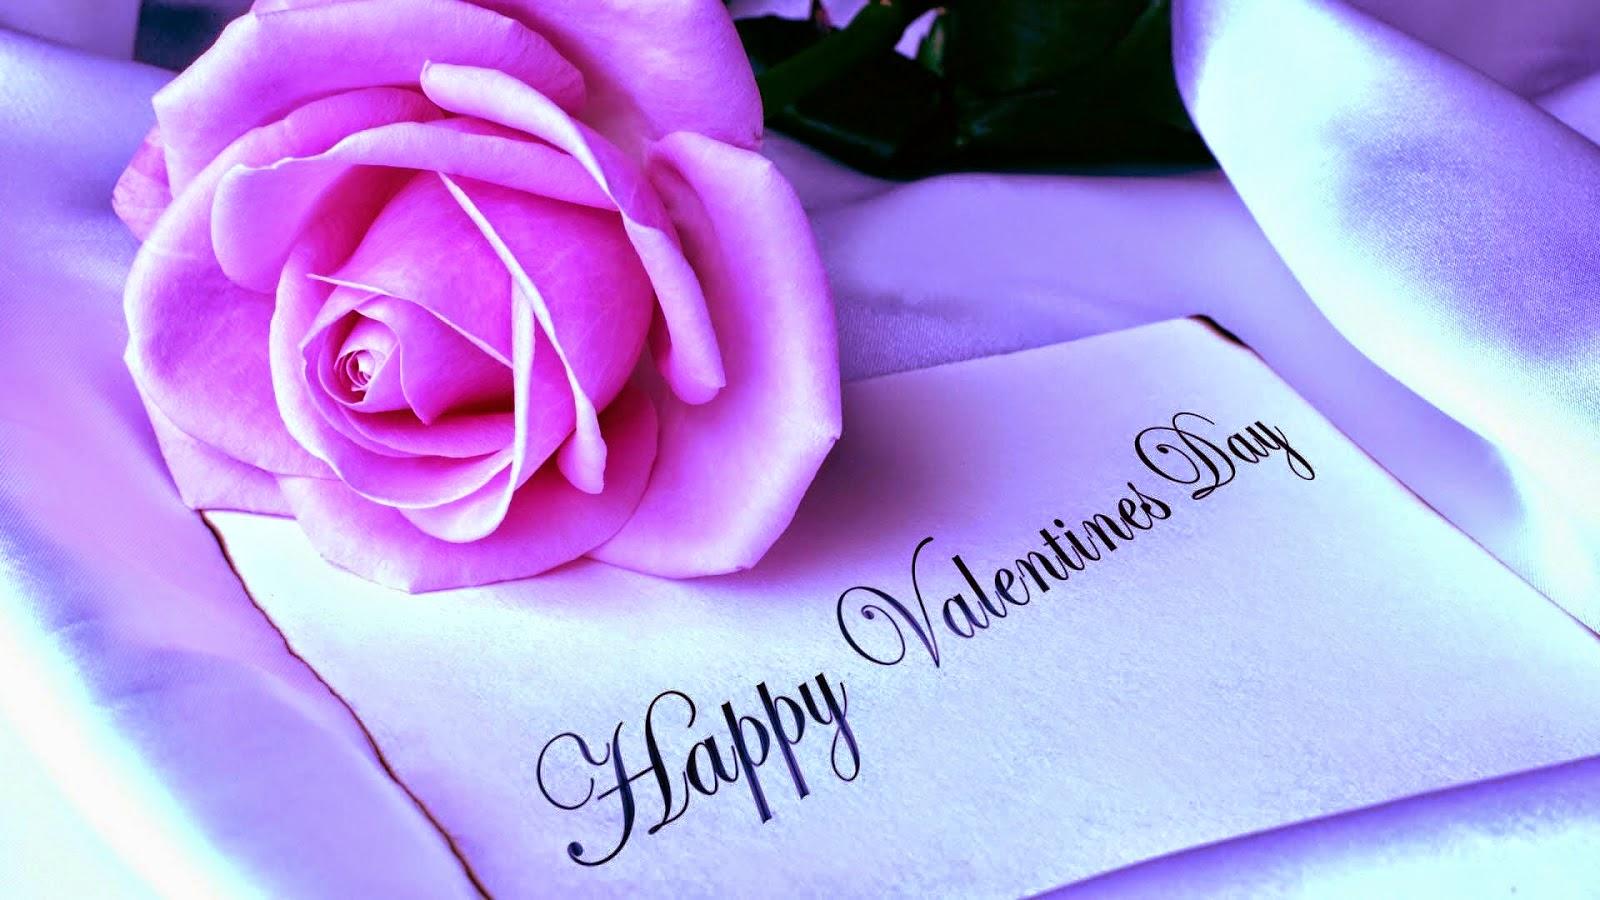 Happy Valentines Day 2015 Happy Valentines Day 2015